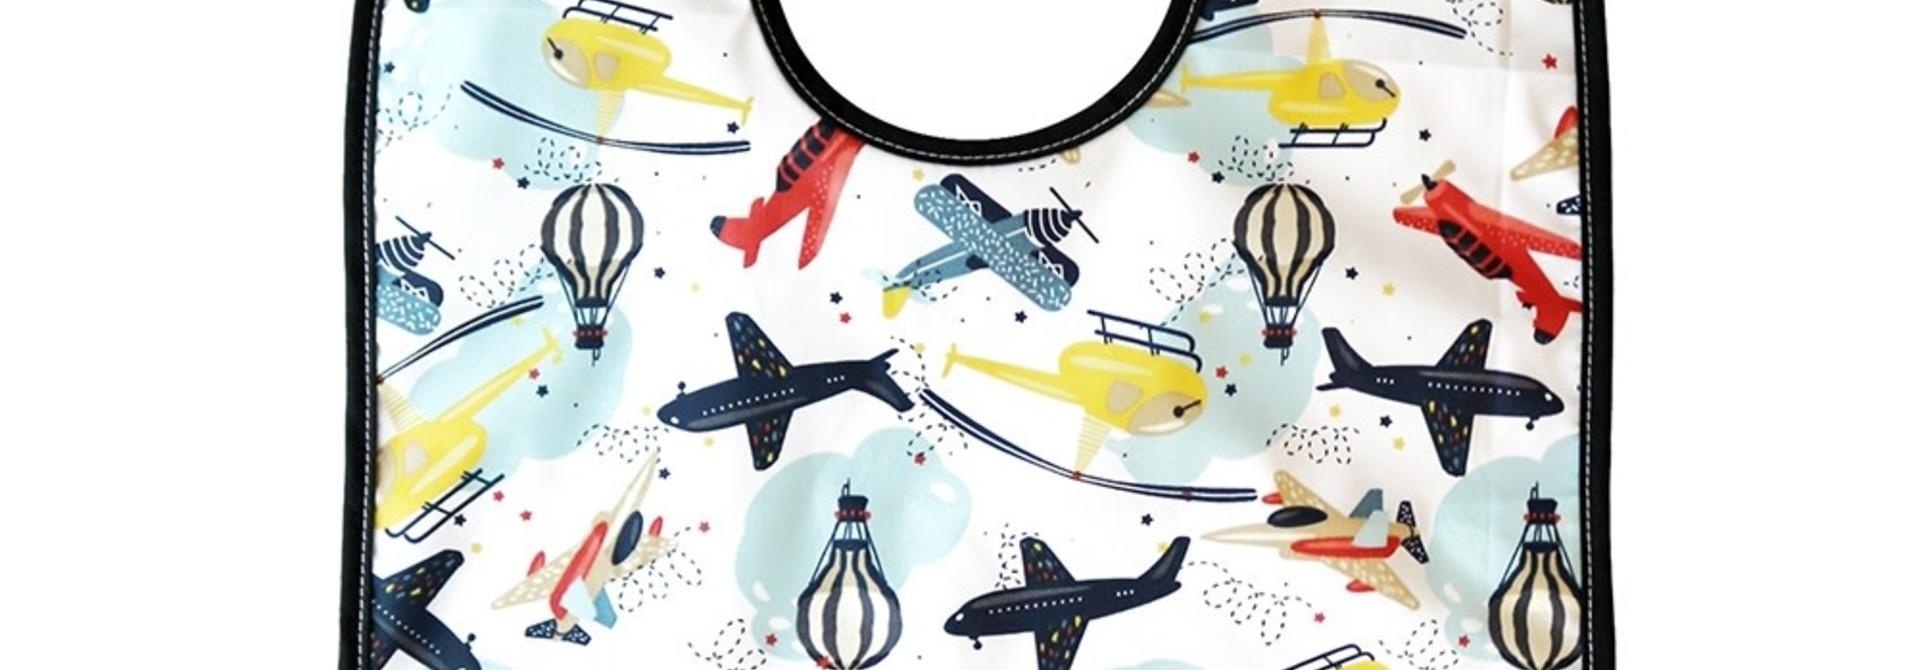 Bavette imperméable - Avions